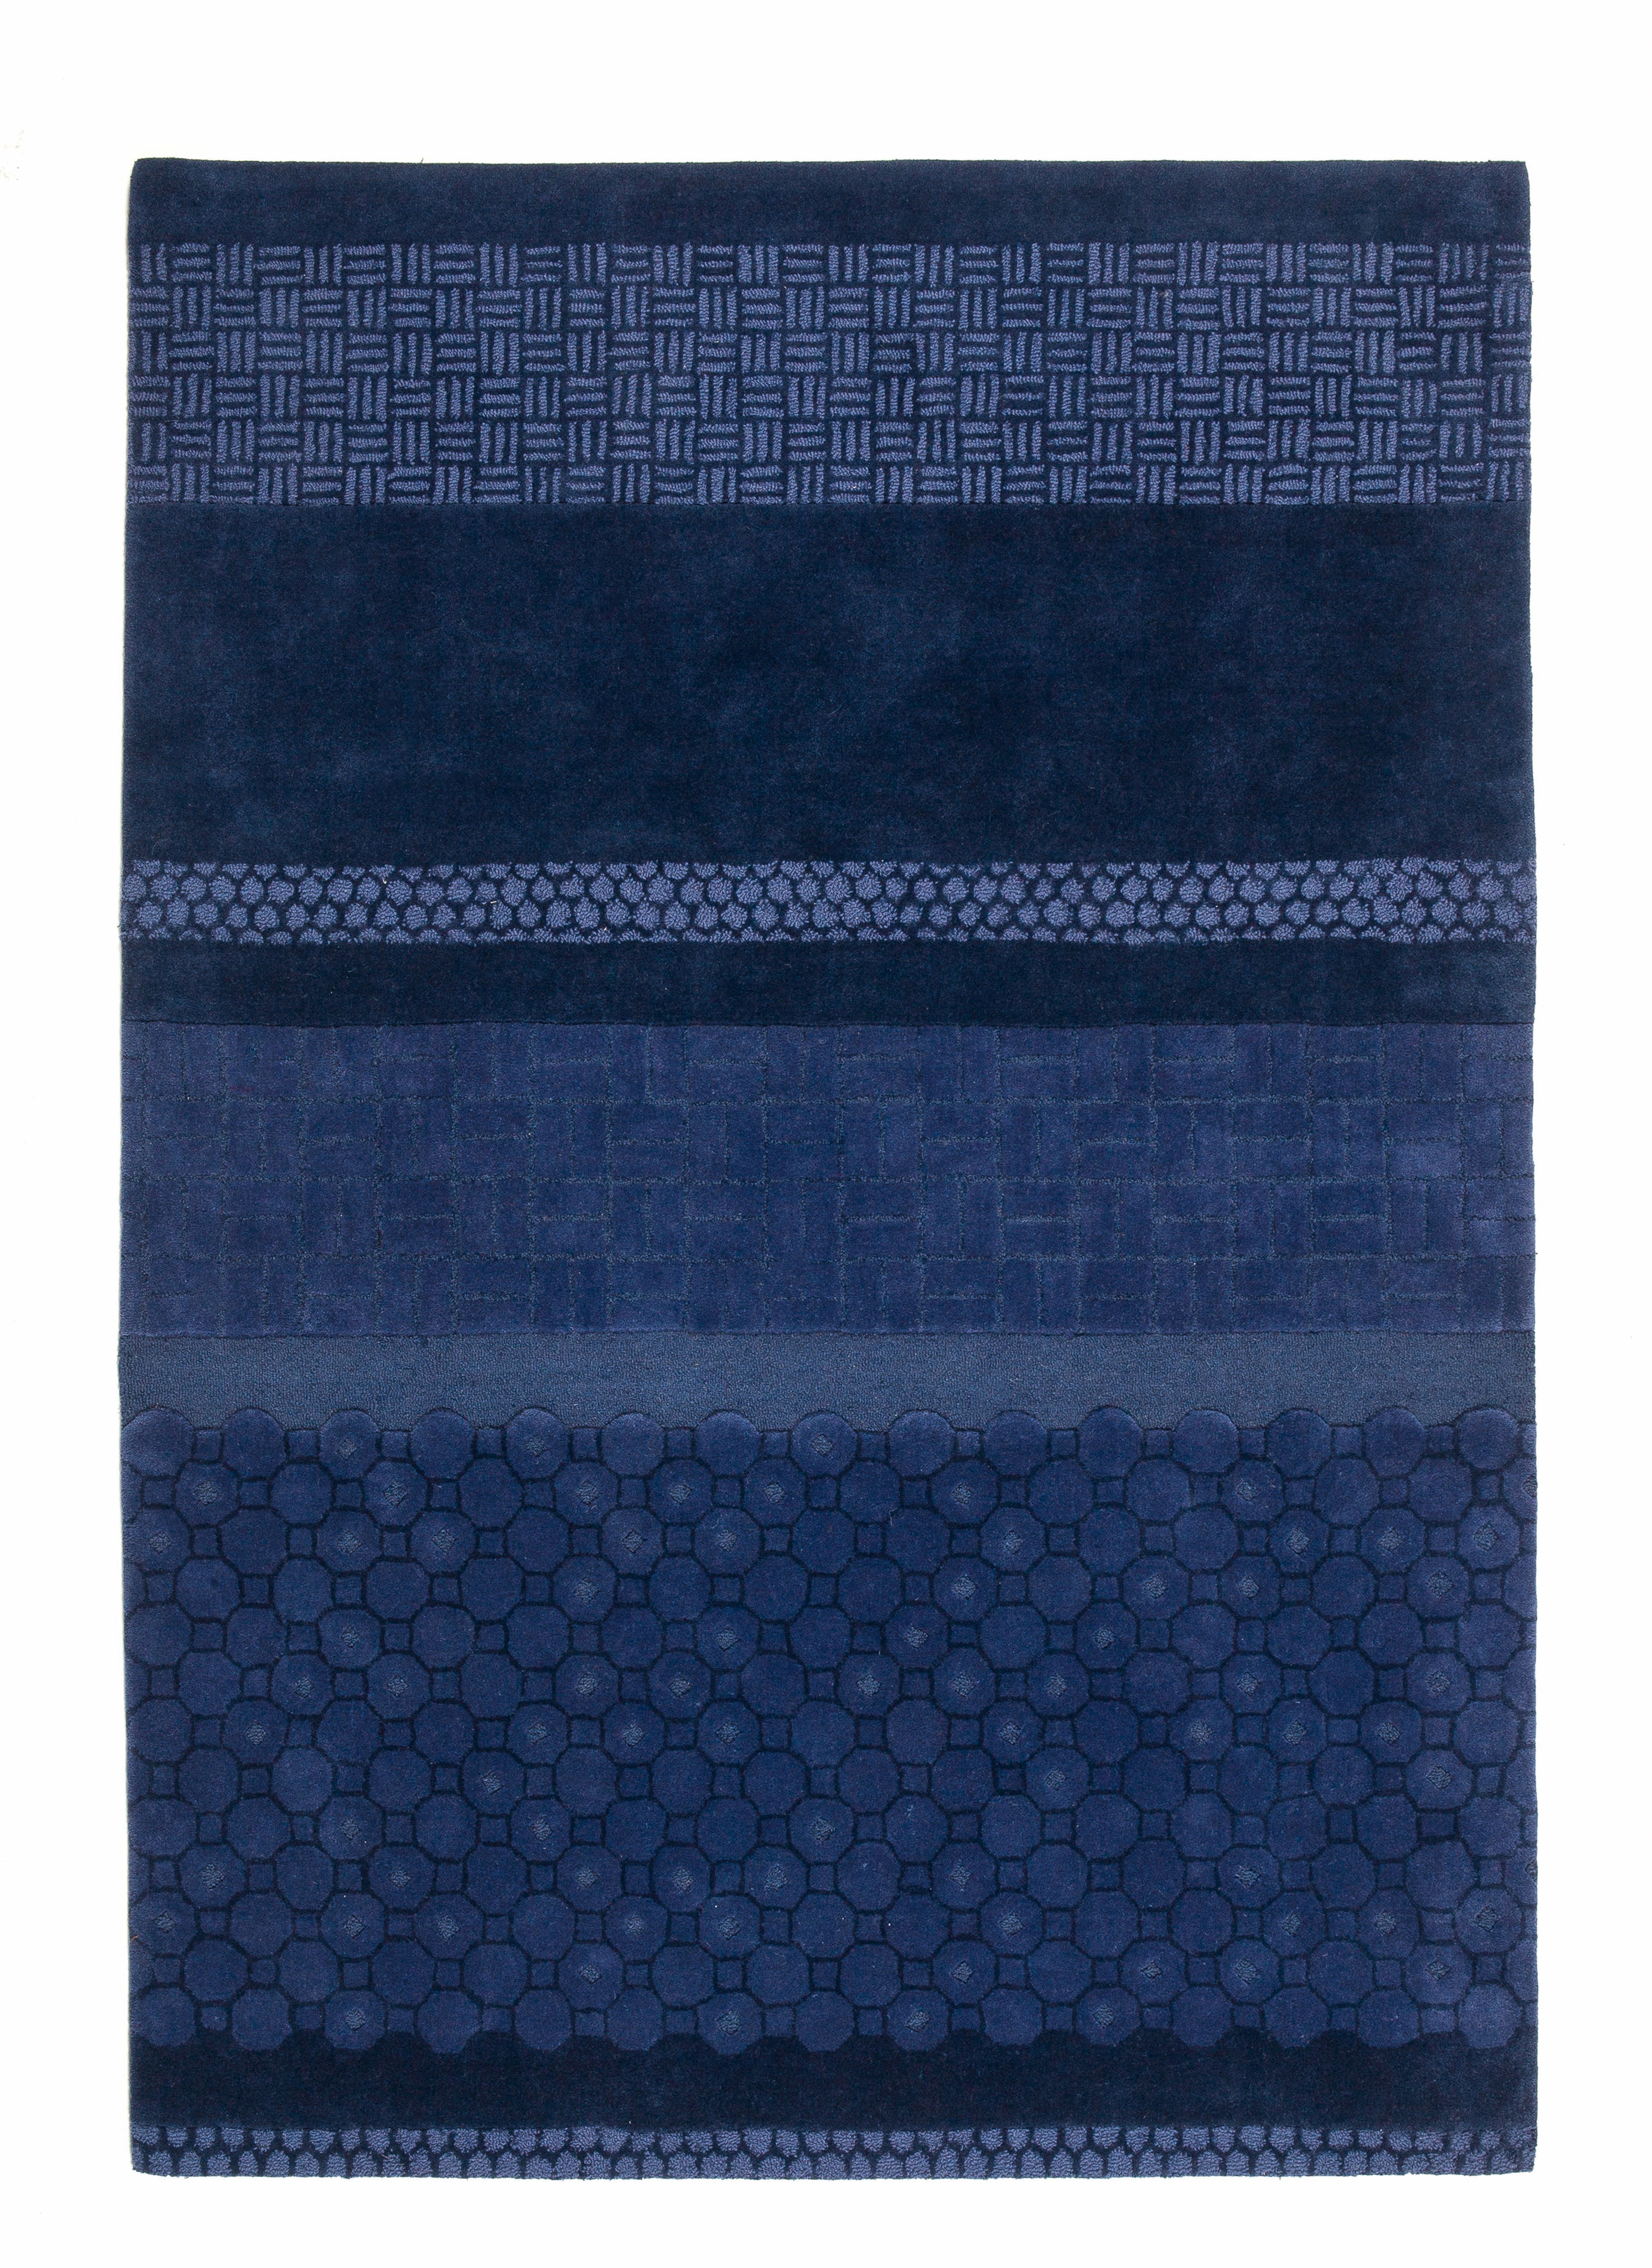 Déco - Tapis - Tapis Jie / 170 x 240 cm - Nanimarquina - Bleu - Laine vierge